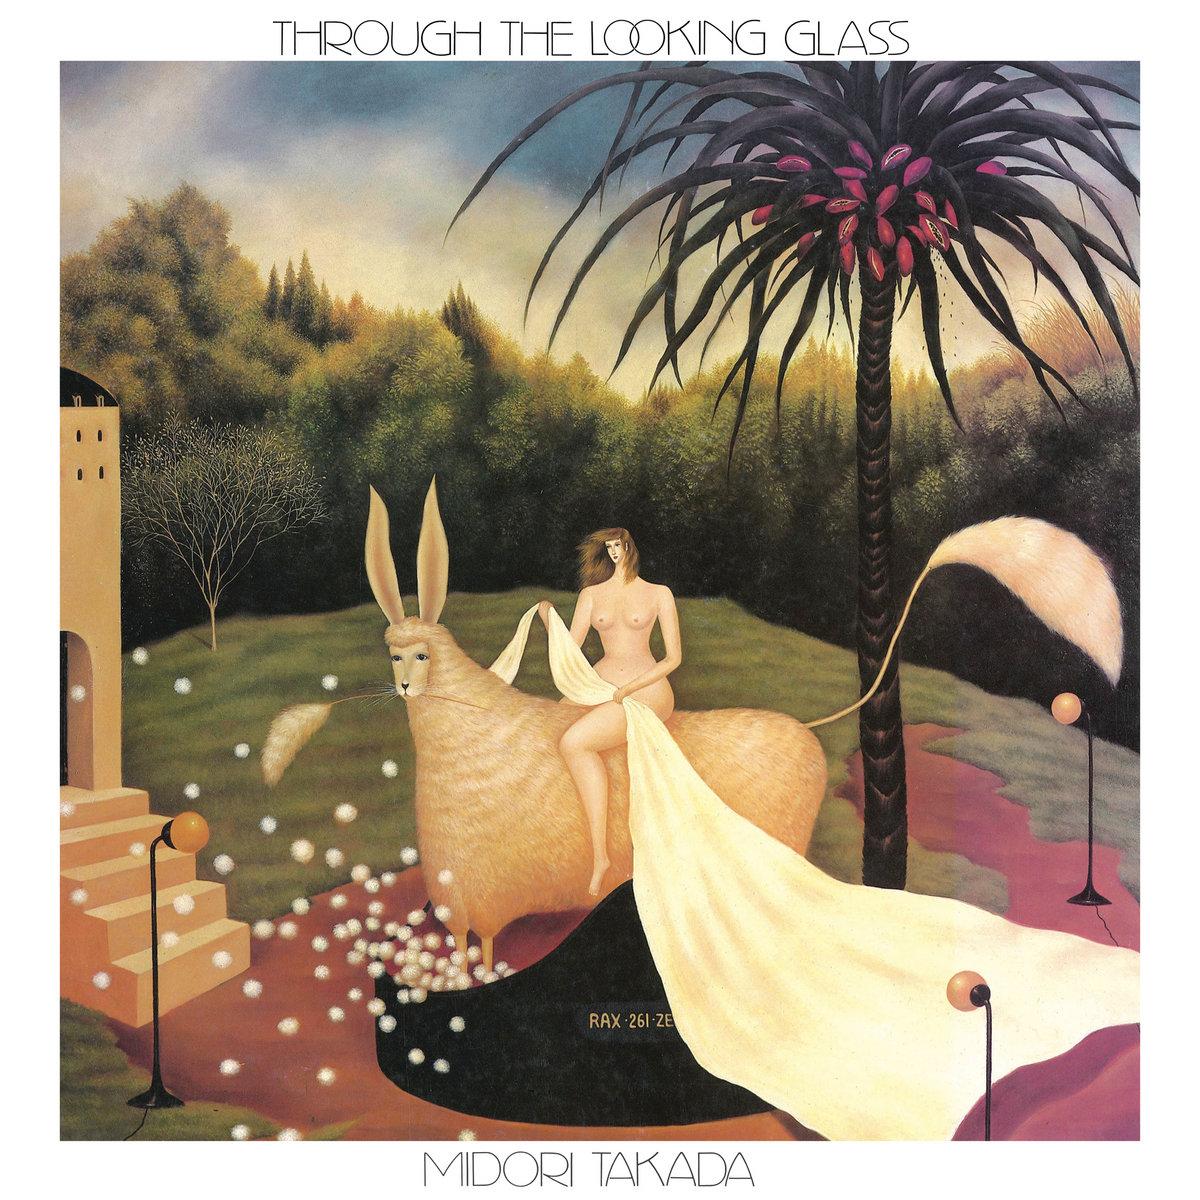 Midori Takada Album Cover Through The Looking Glass